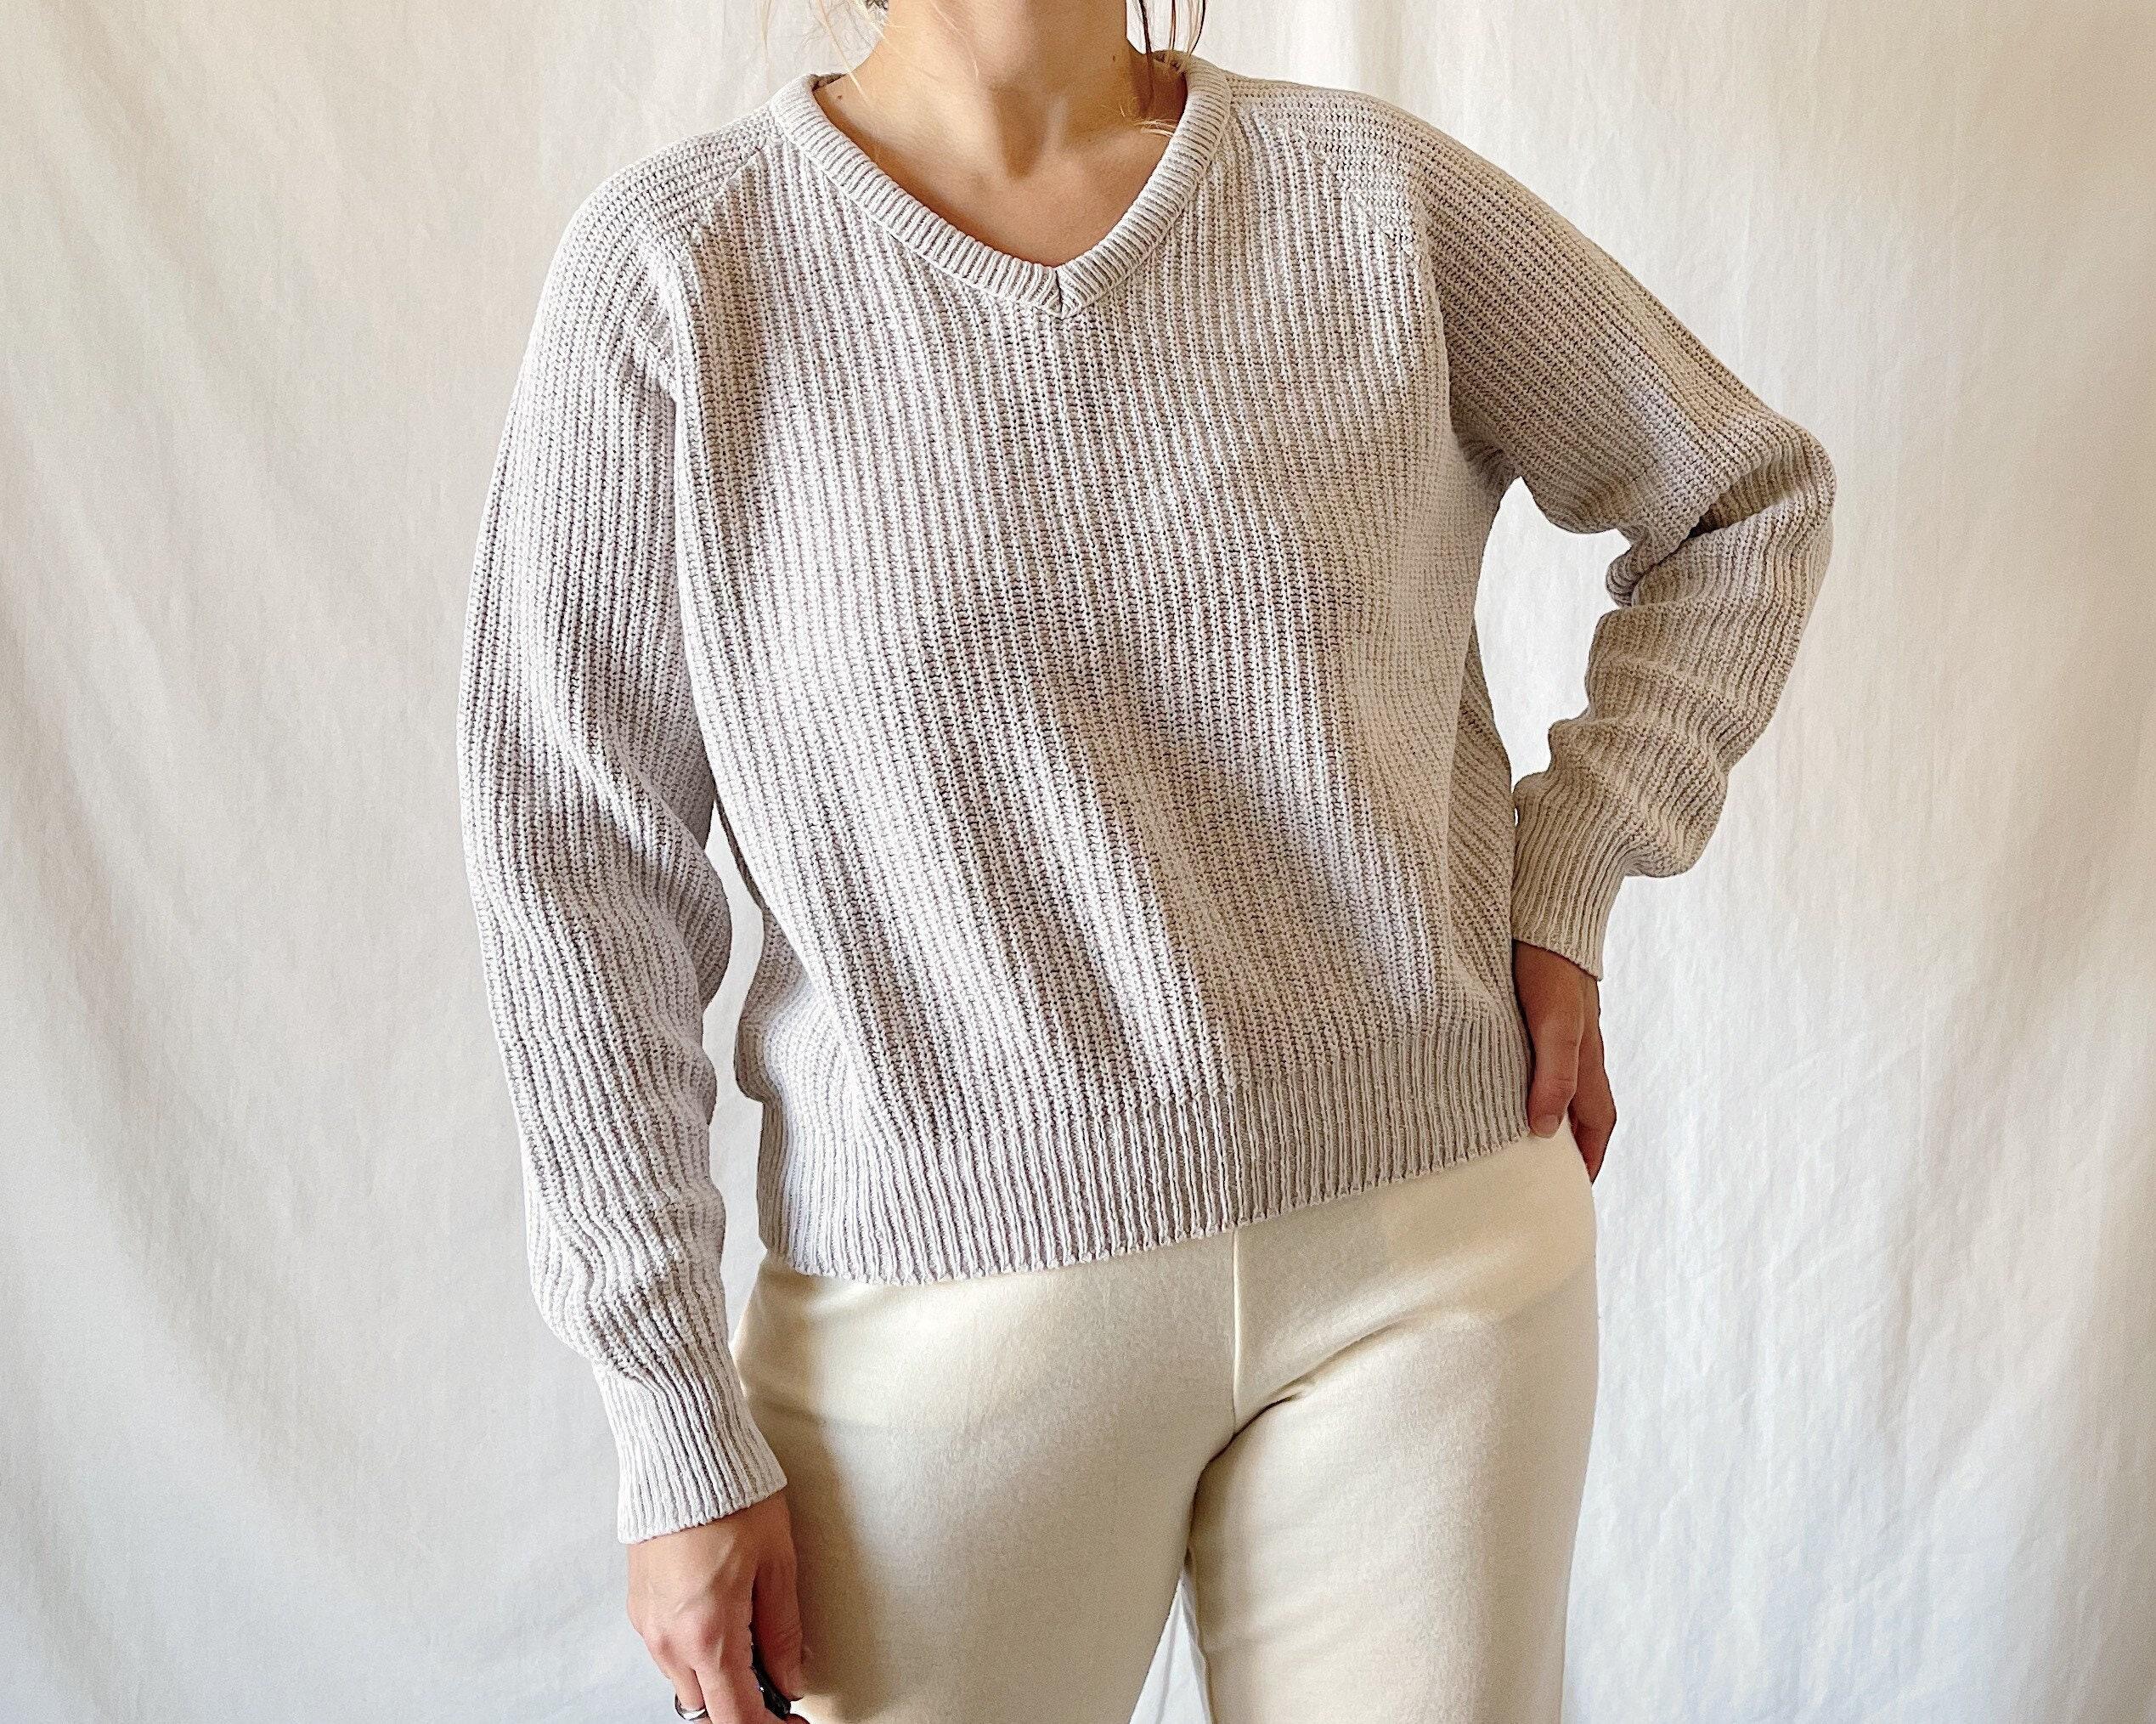 80s Sweatshirts, Sweaters, Vests | Women 1980S Jantzen Light Grey Cotton V-Neck Sweater $30.00 AT vintagedancer.com